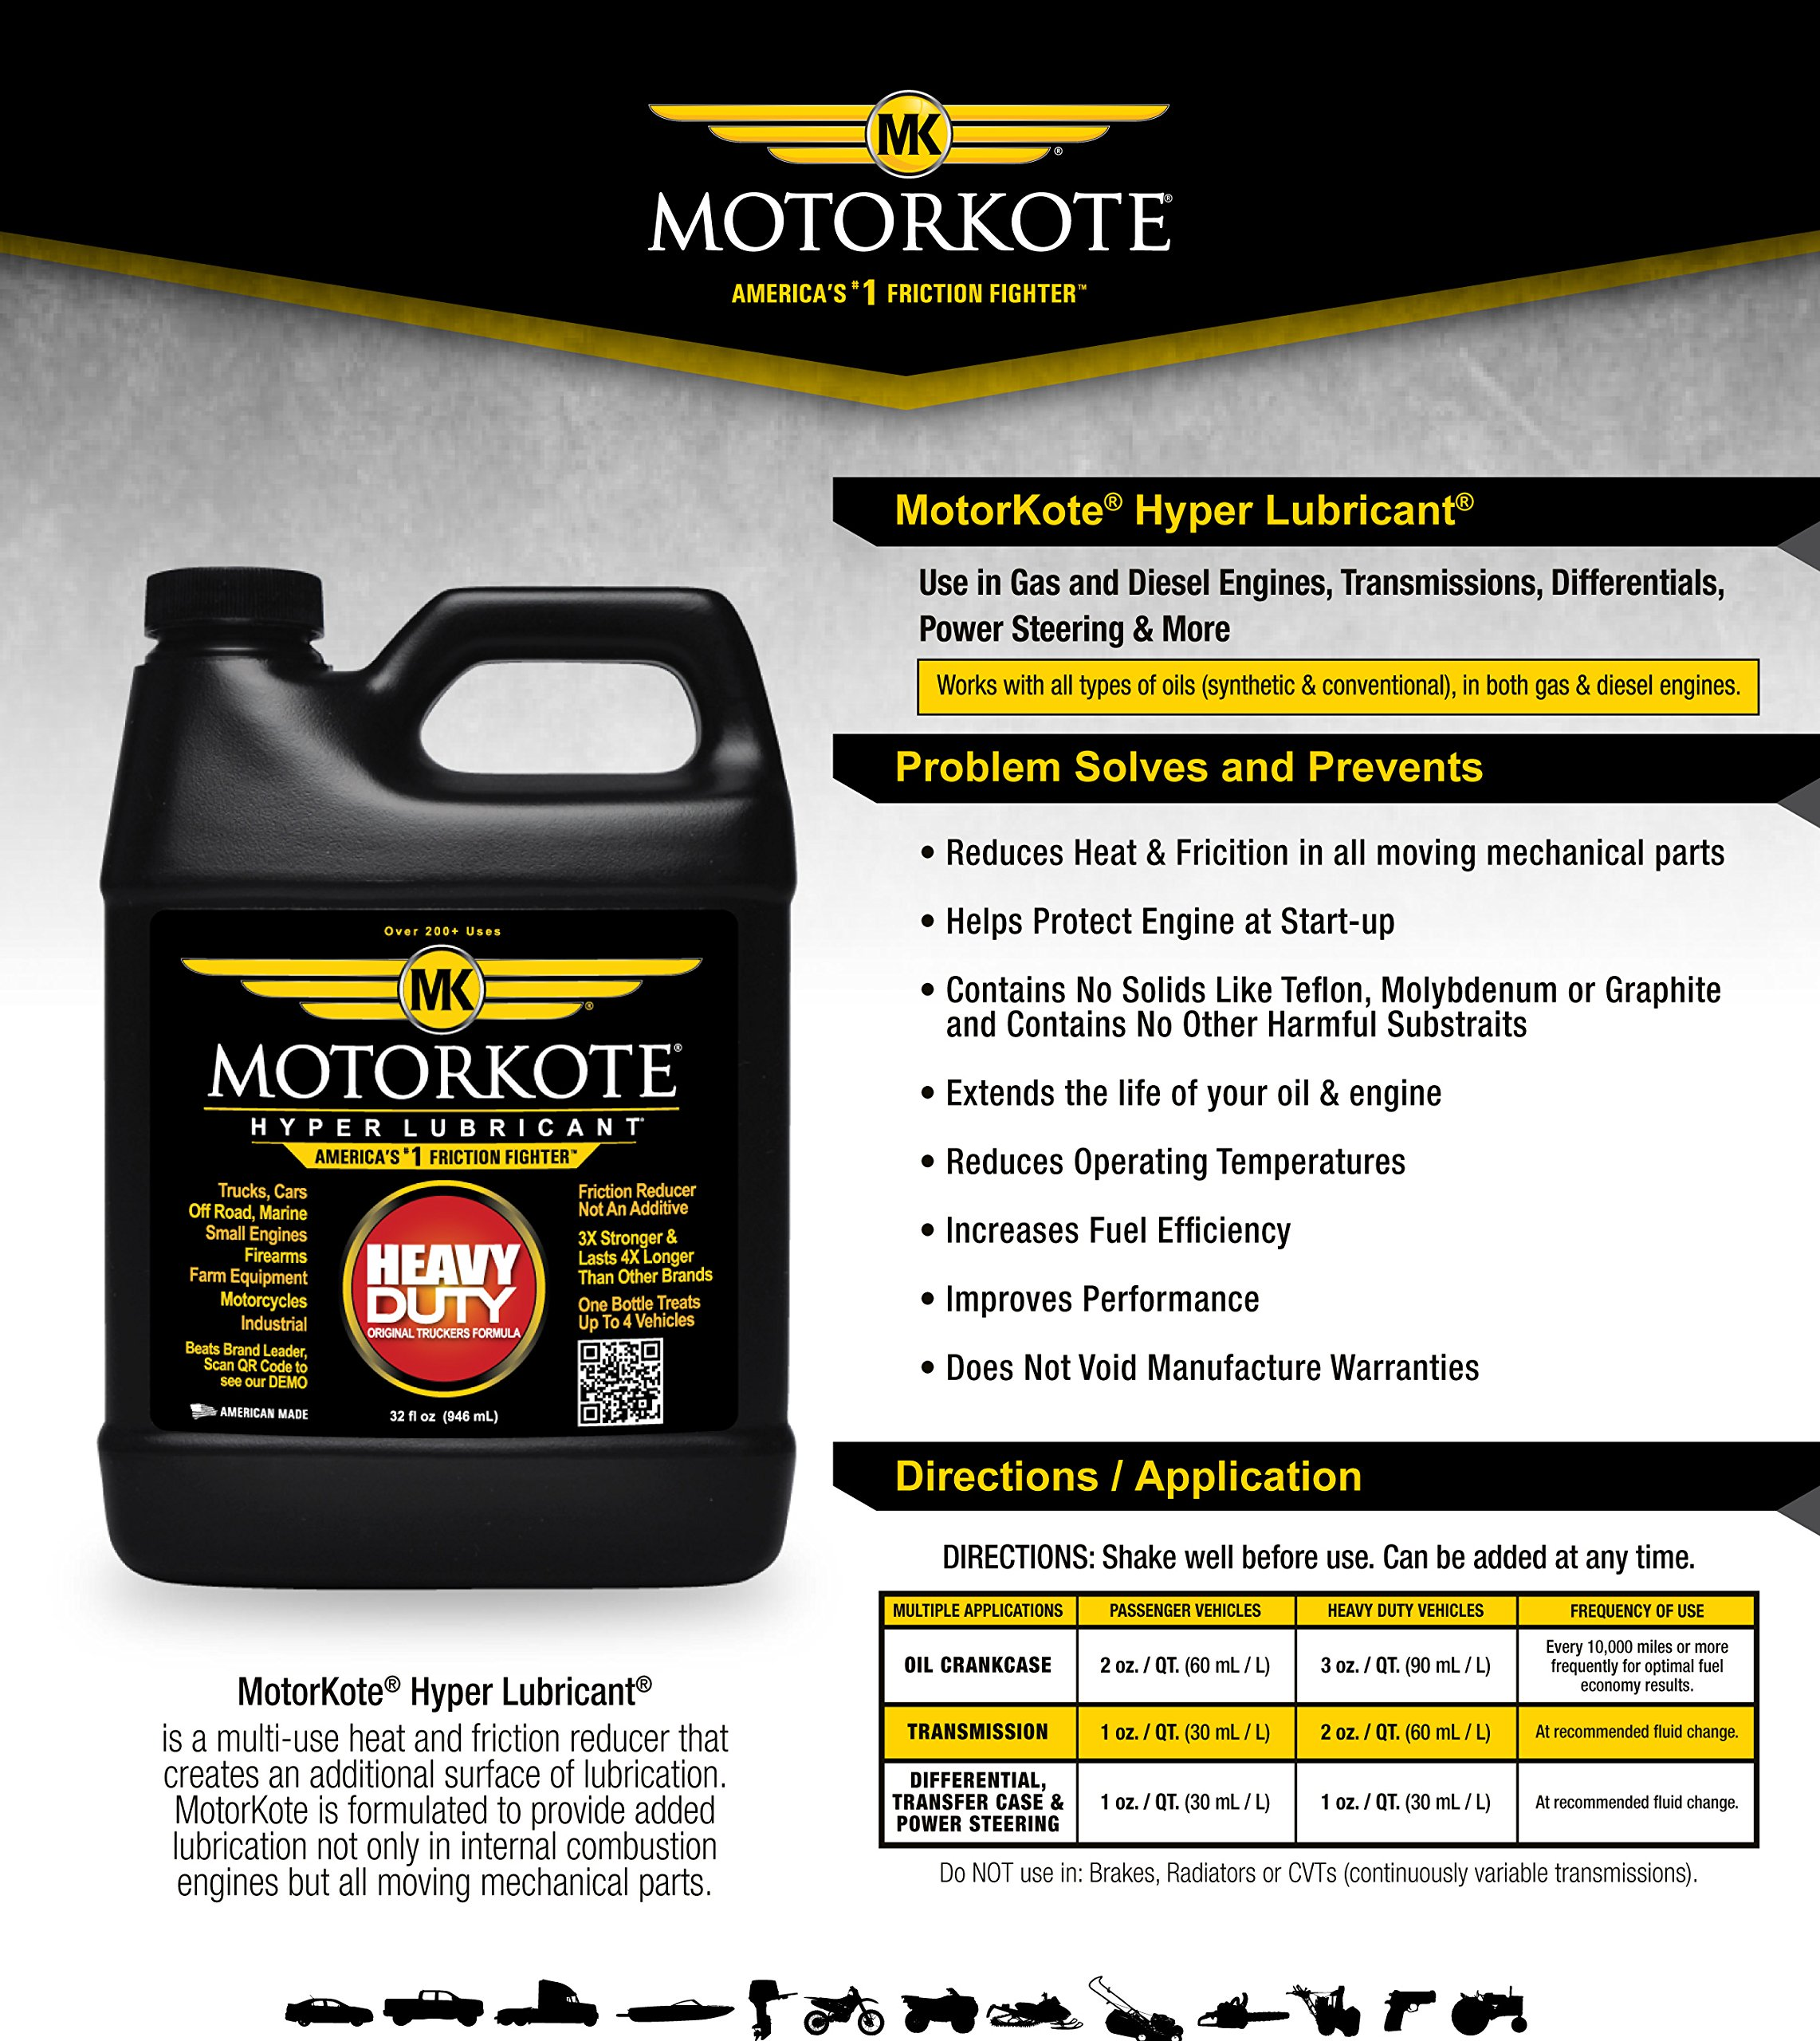 Motorkote MK-HL32-06-6PK Heavy Duty Hyper Lubricant, 32-Ounce, 6-Pack by Motorkote (Image #4)